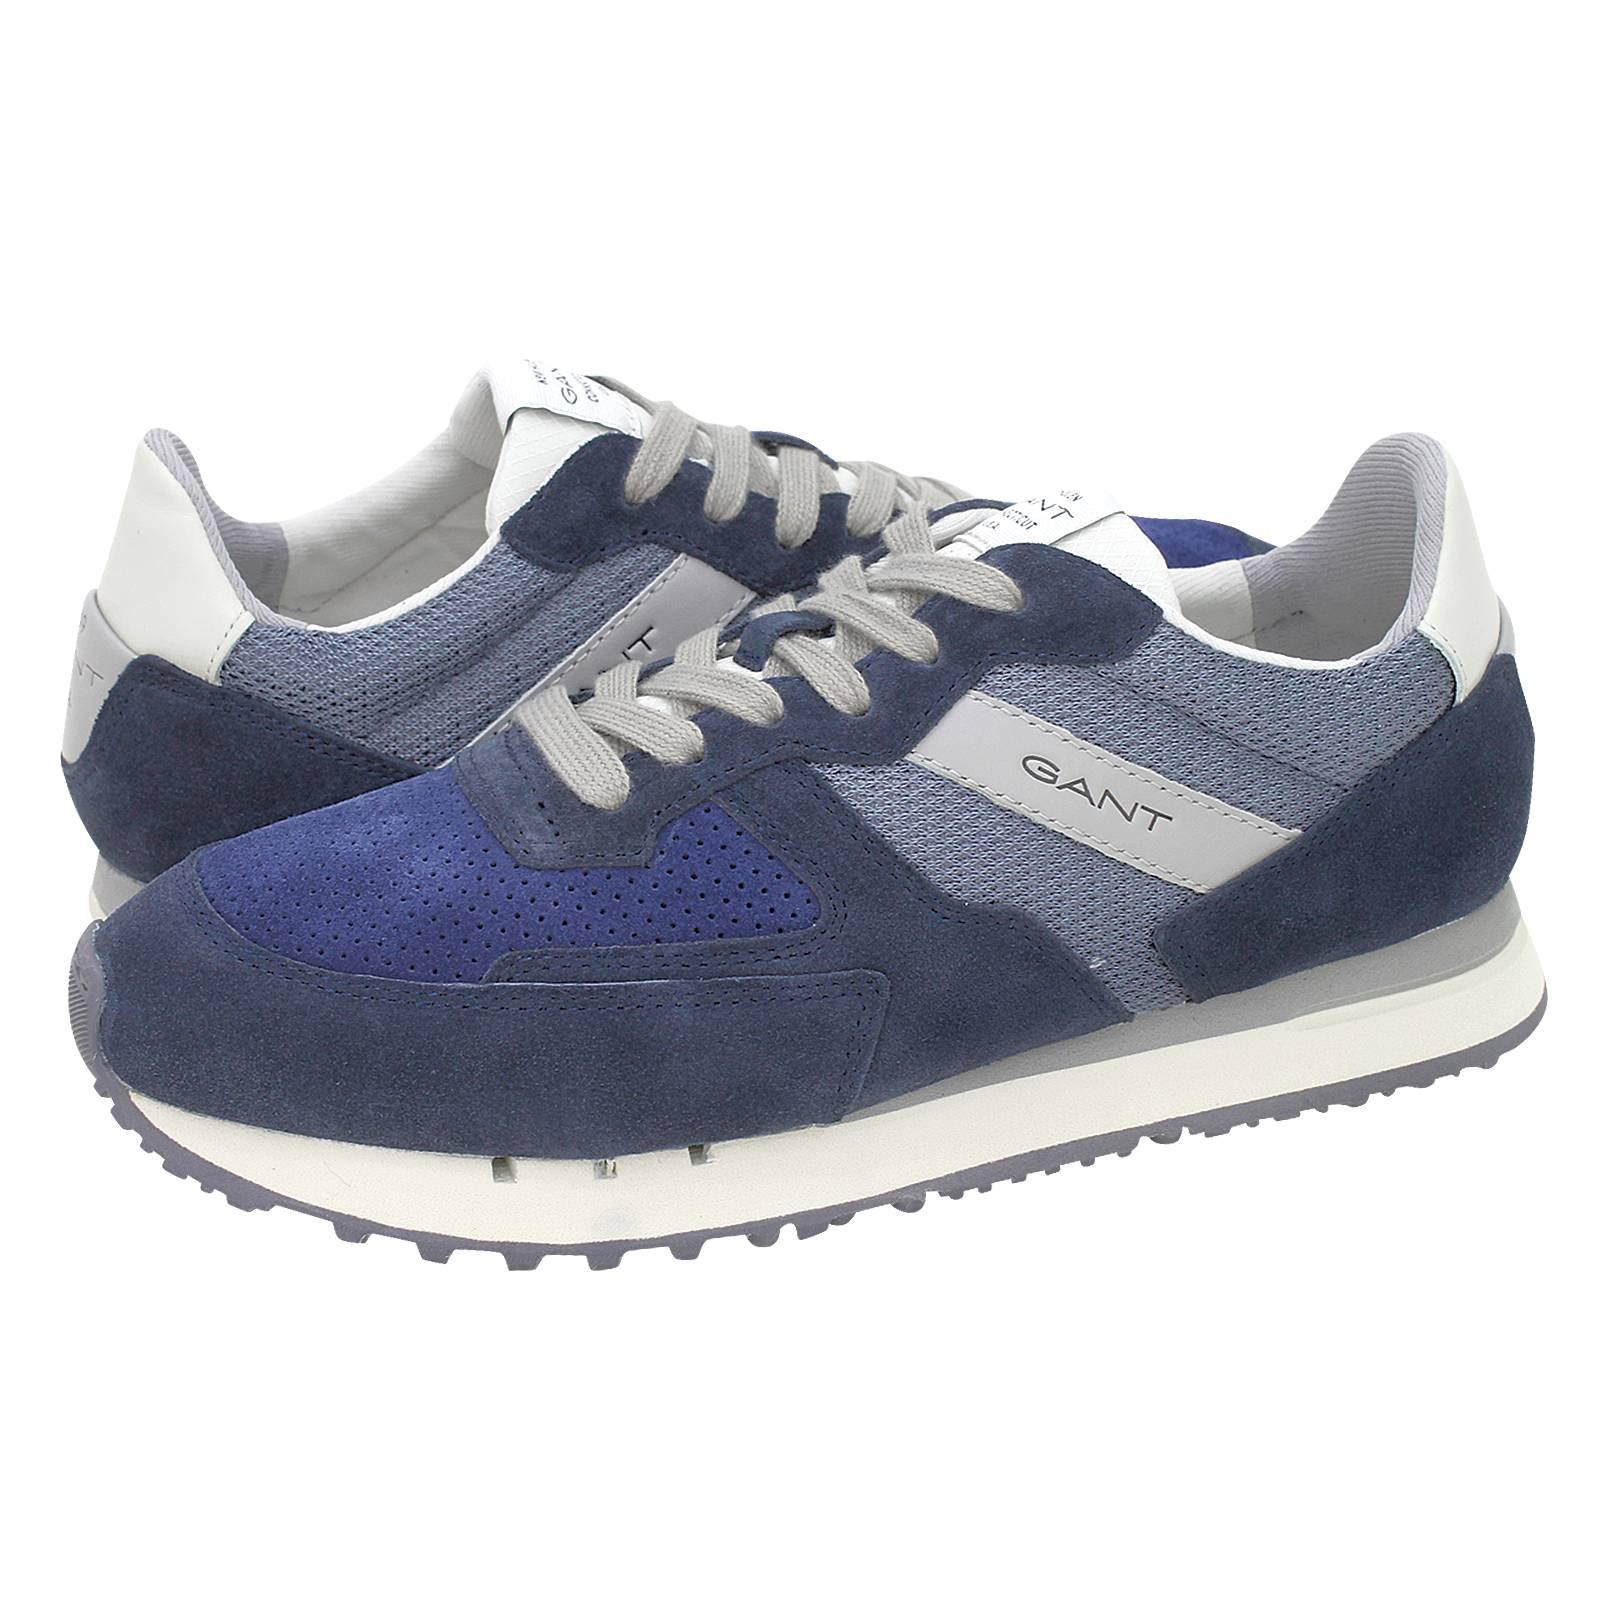 339d7188758 Duke - Ανδρικά παπούτσια casual Gant από καστορι, υφασμα και δερμα ...